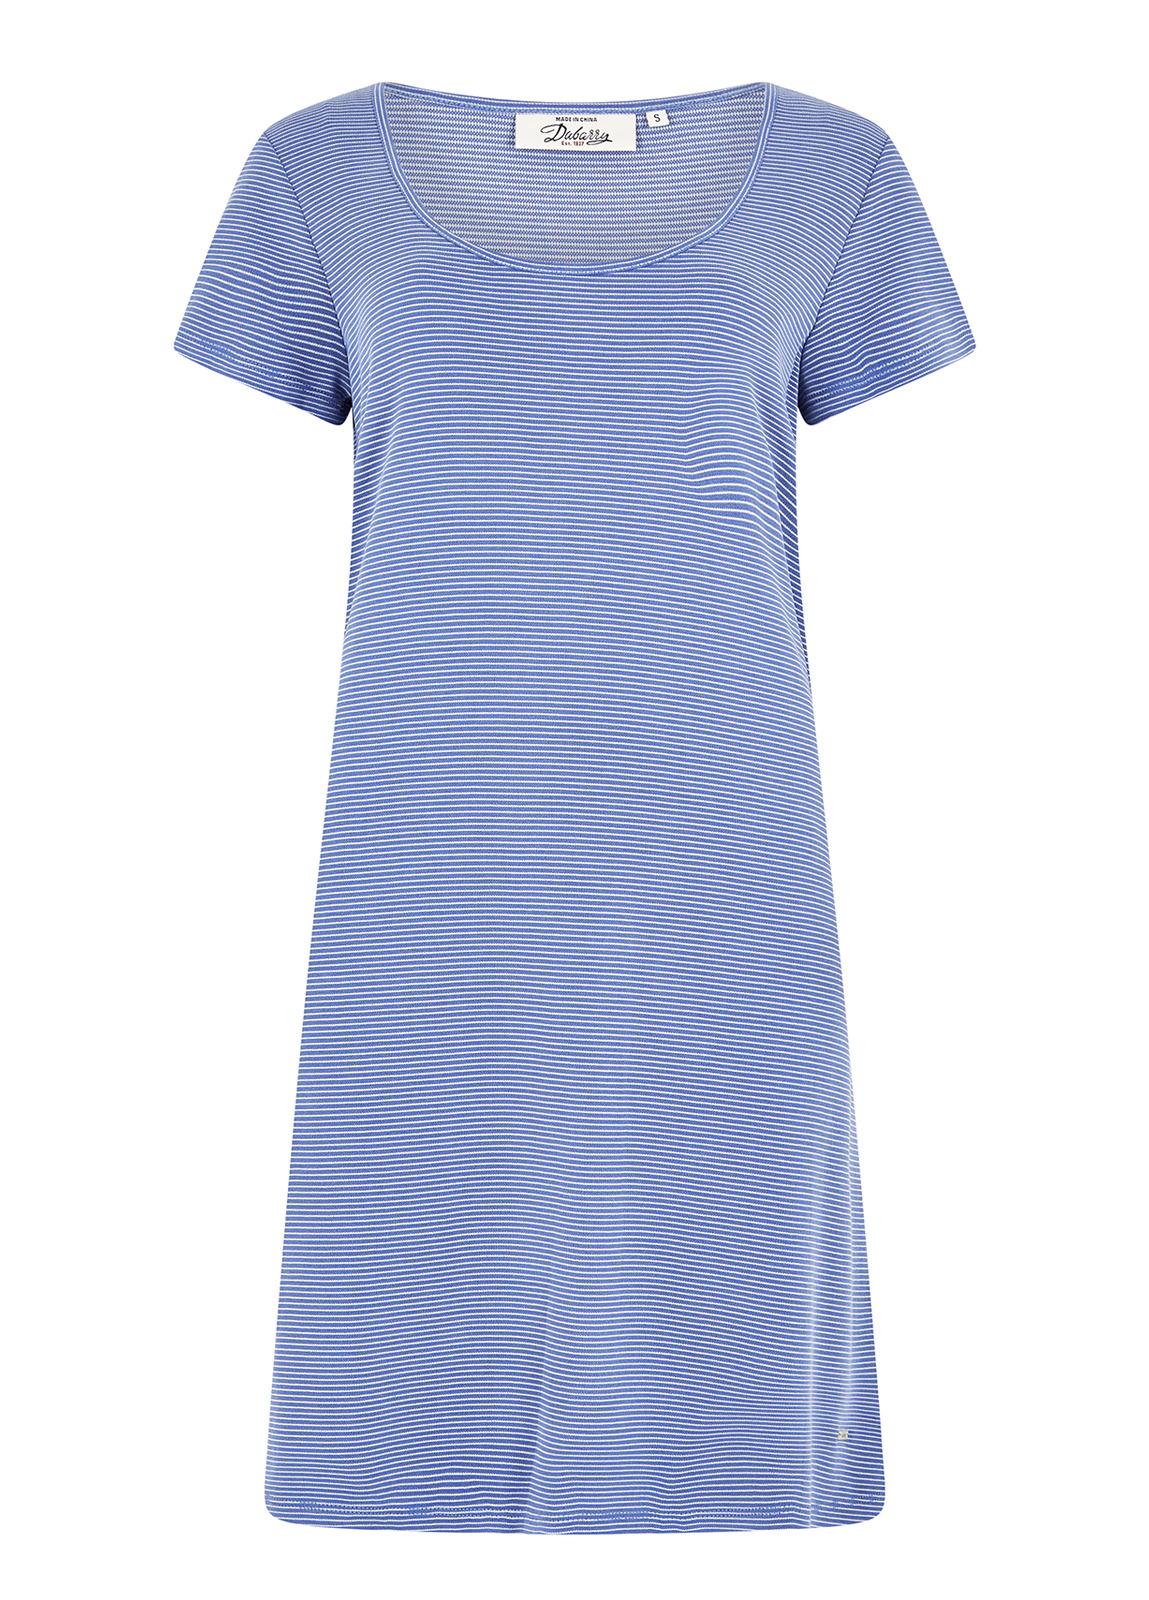 Dubarry_Suncroft Dress - Royal Blue_Image_2